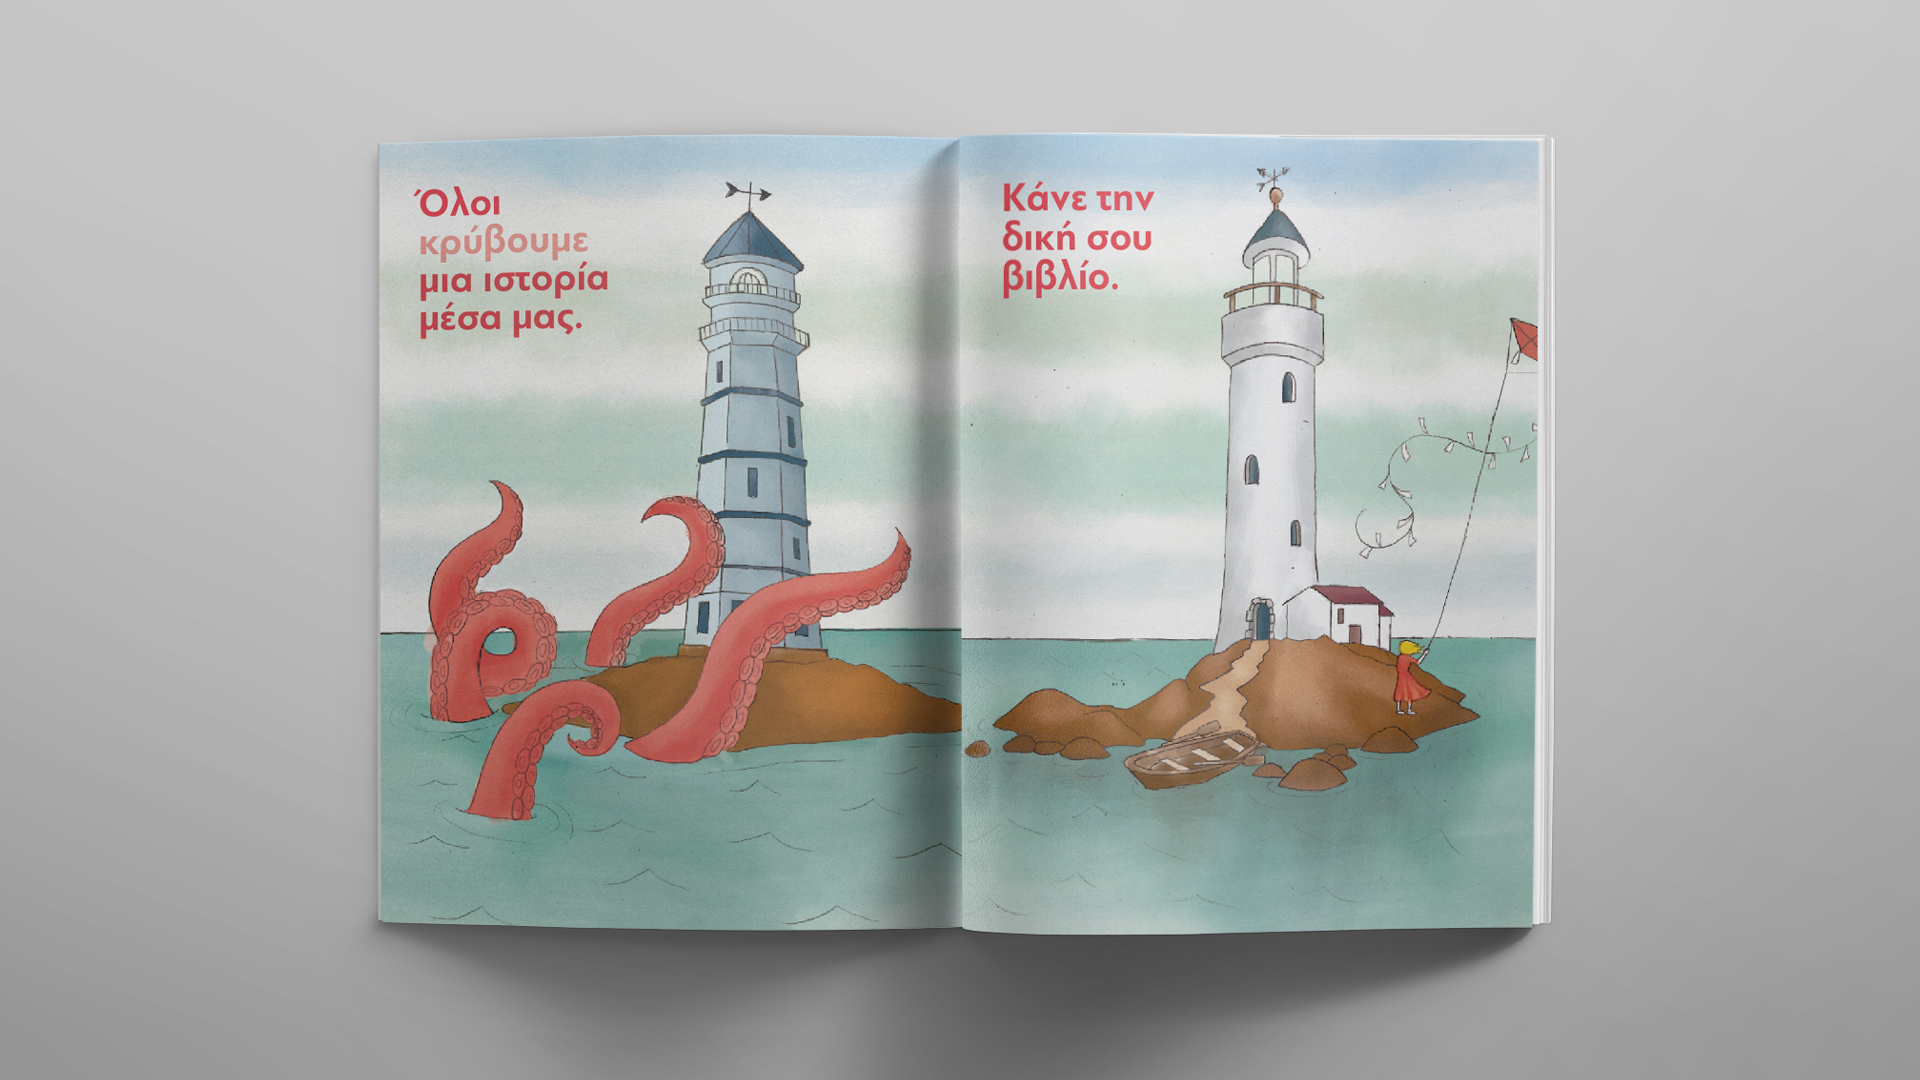 designpark_bookoo_press_kit_book_design